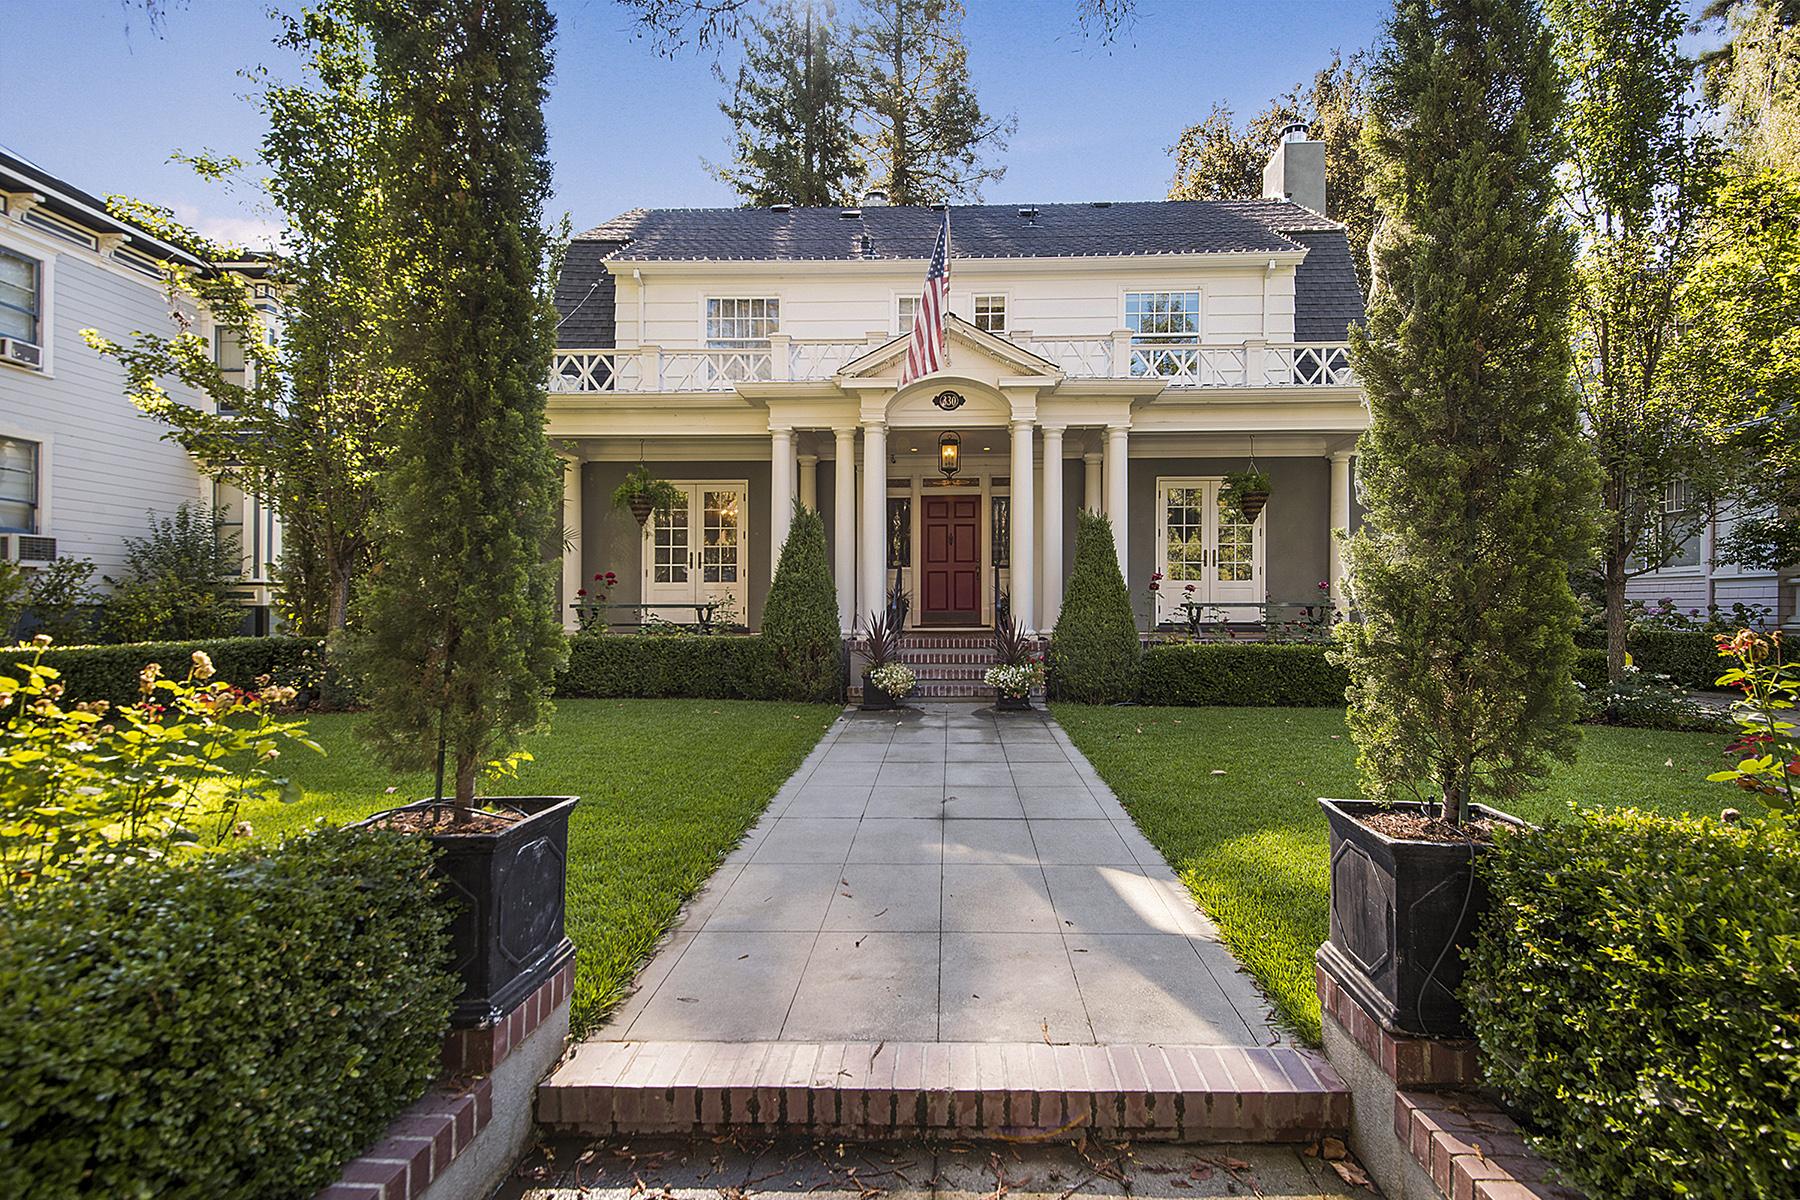 Single Family Home for Sale at 330 Franklin St, Napa, CA 94559 330 Franklin St Napa, California, 94559 United States